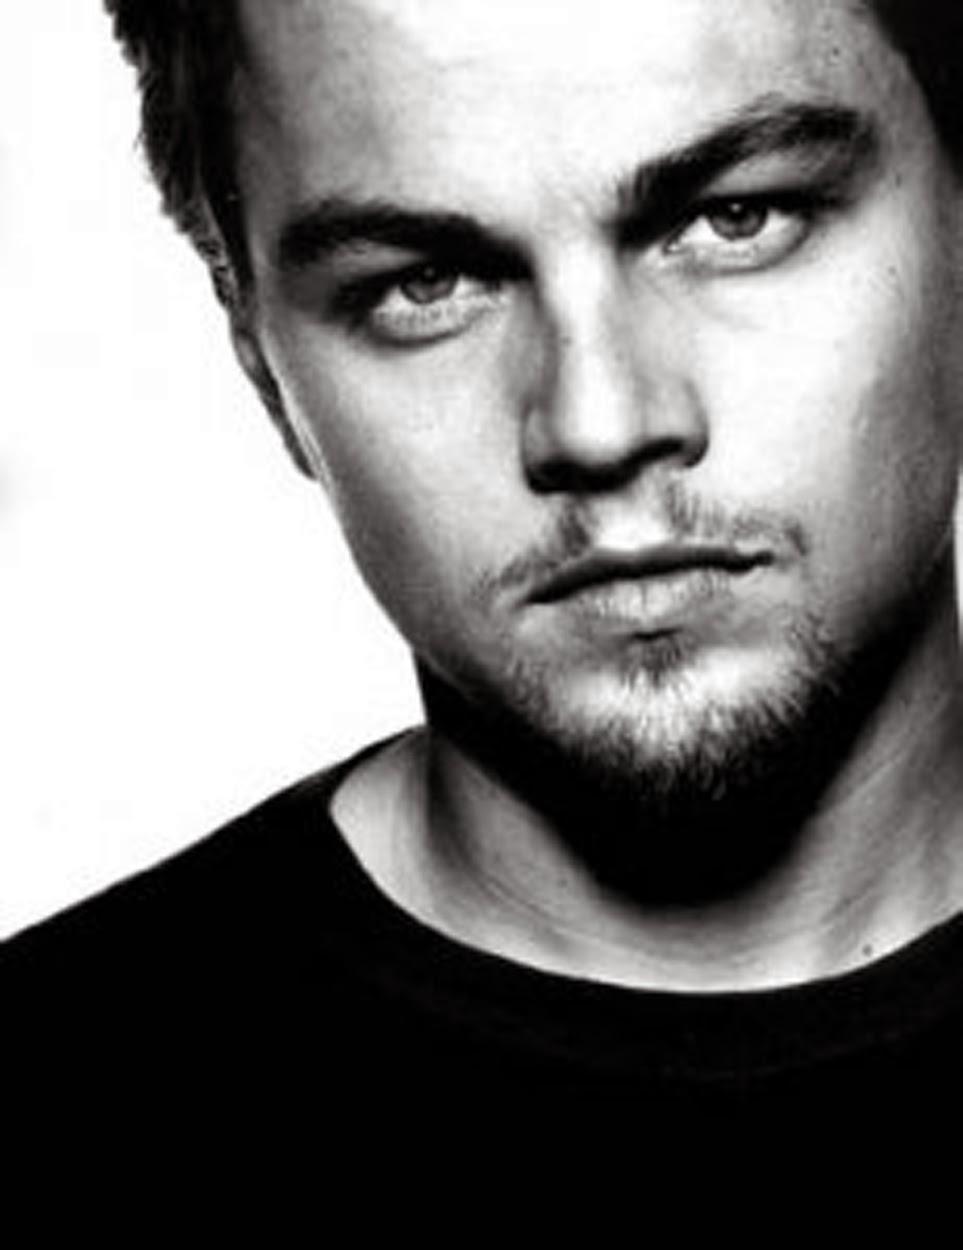 Leonardo DiCaprio HD Wallpapers Free Download